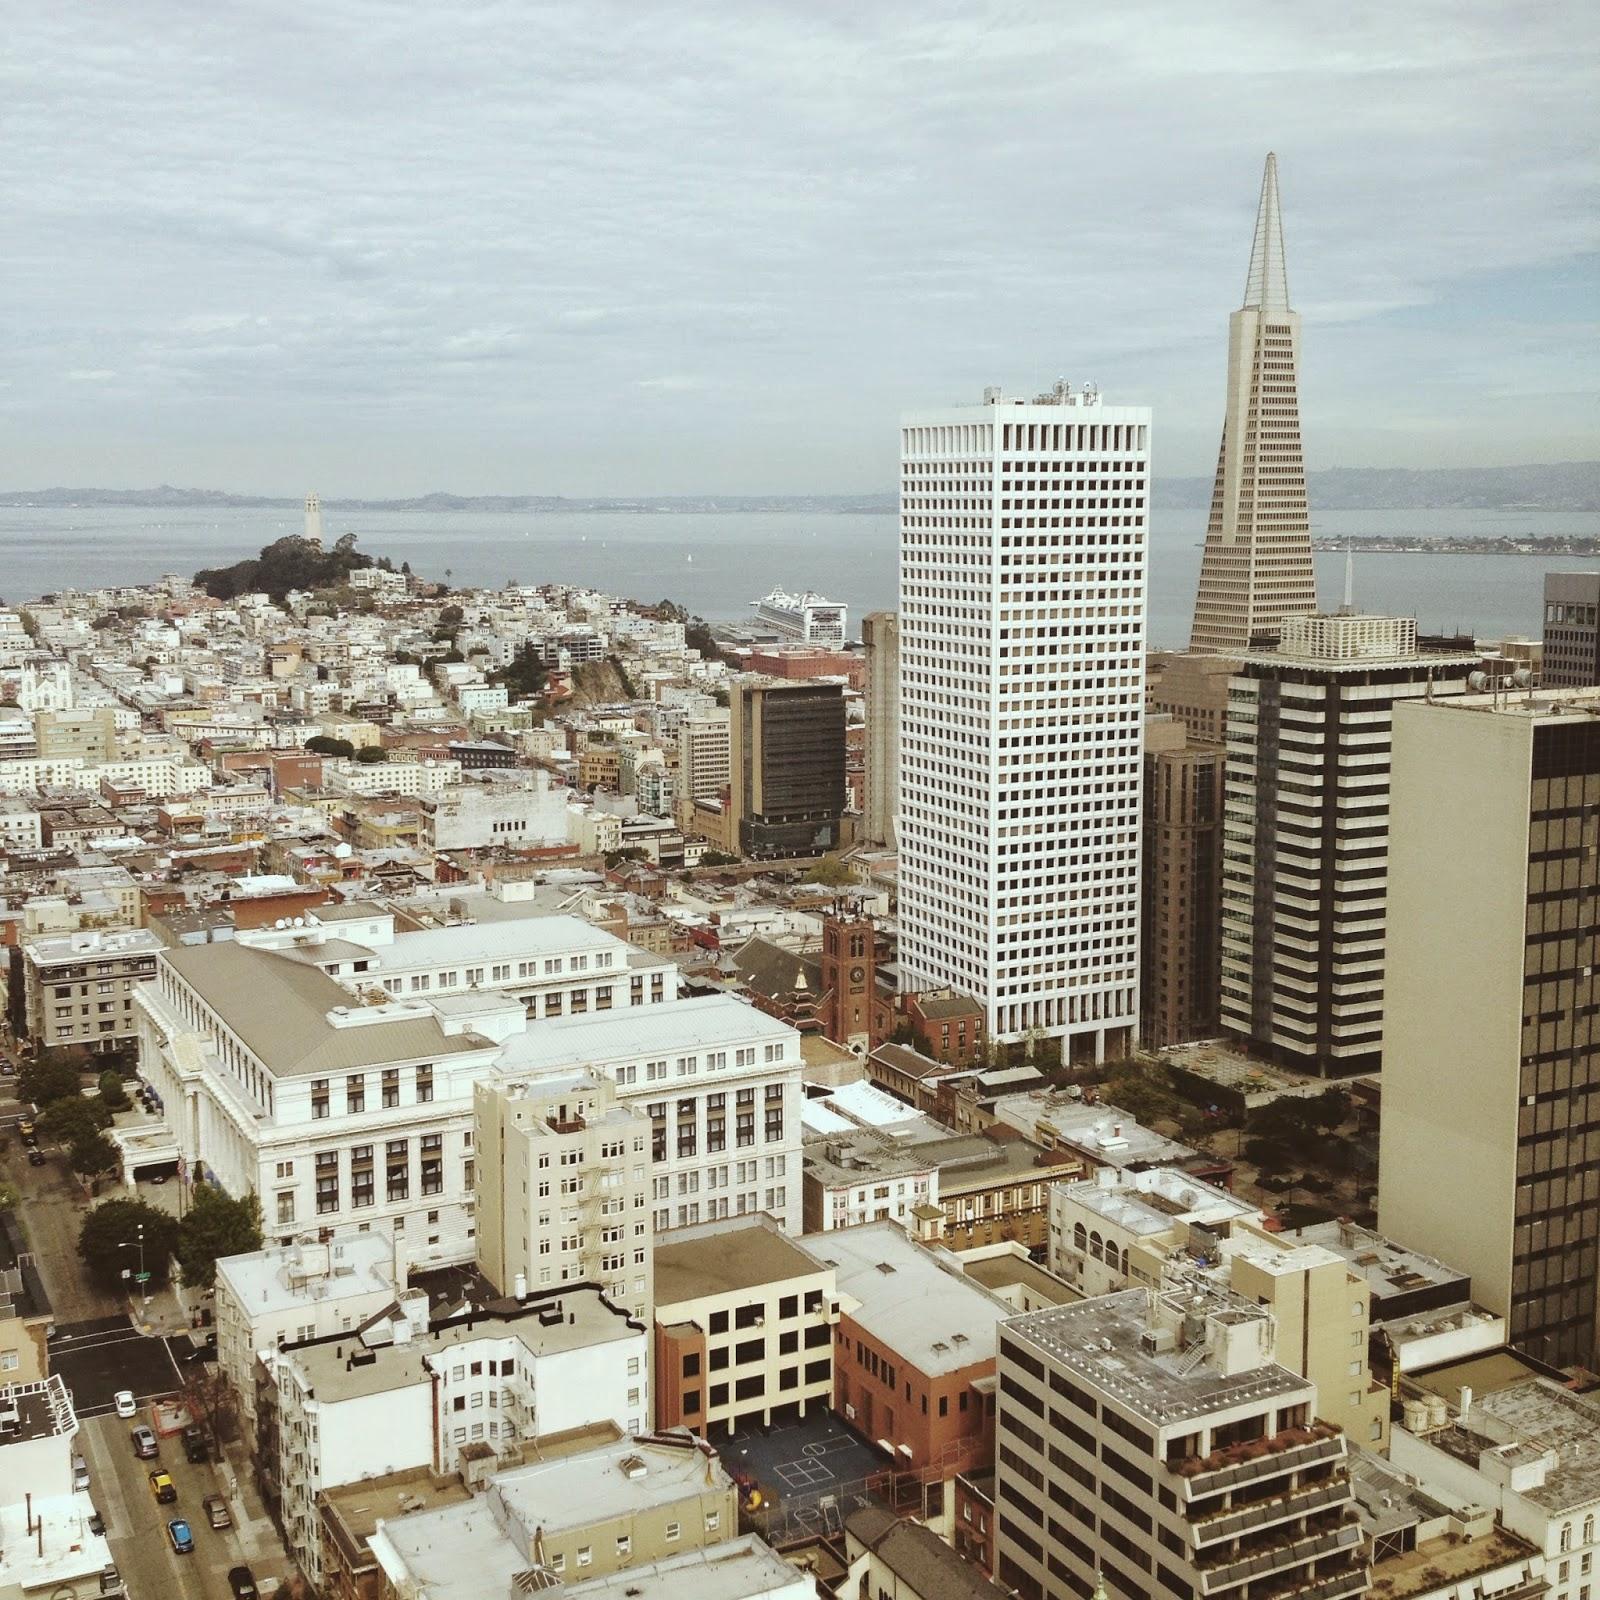 view of San Francisco city and bay